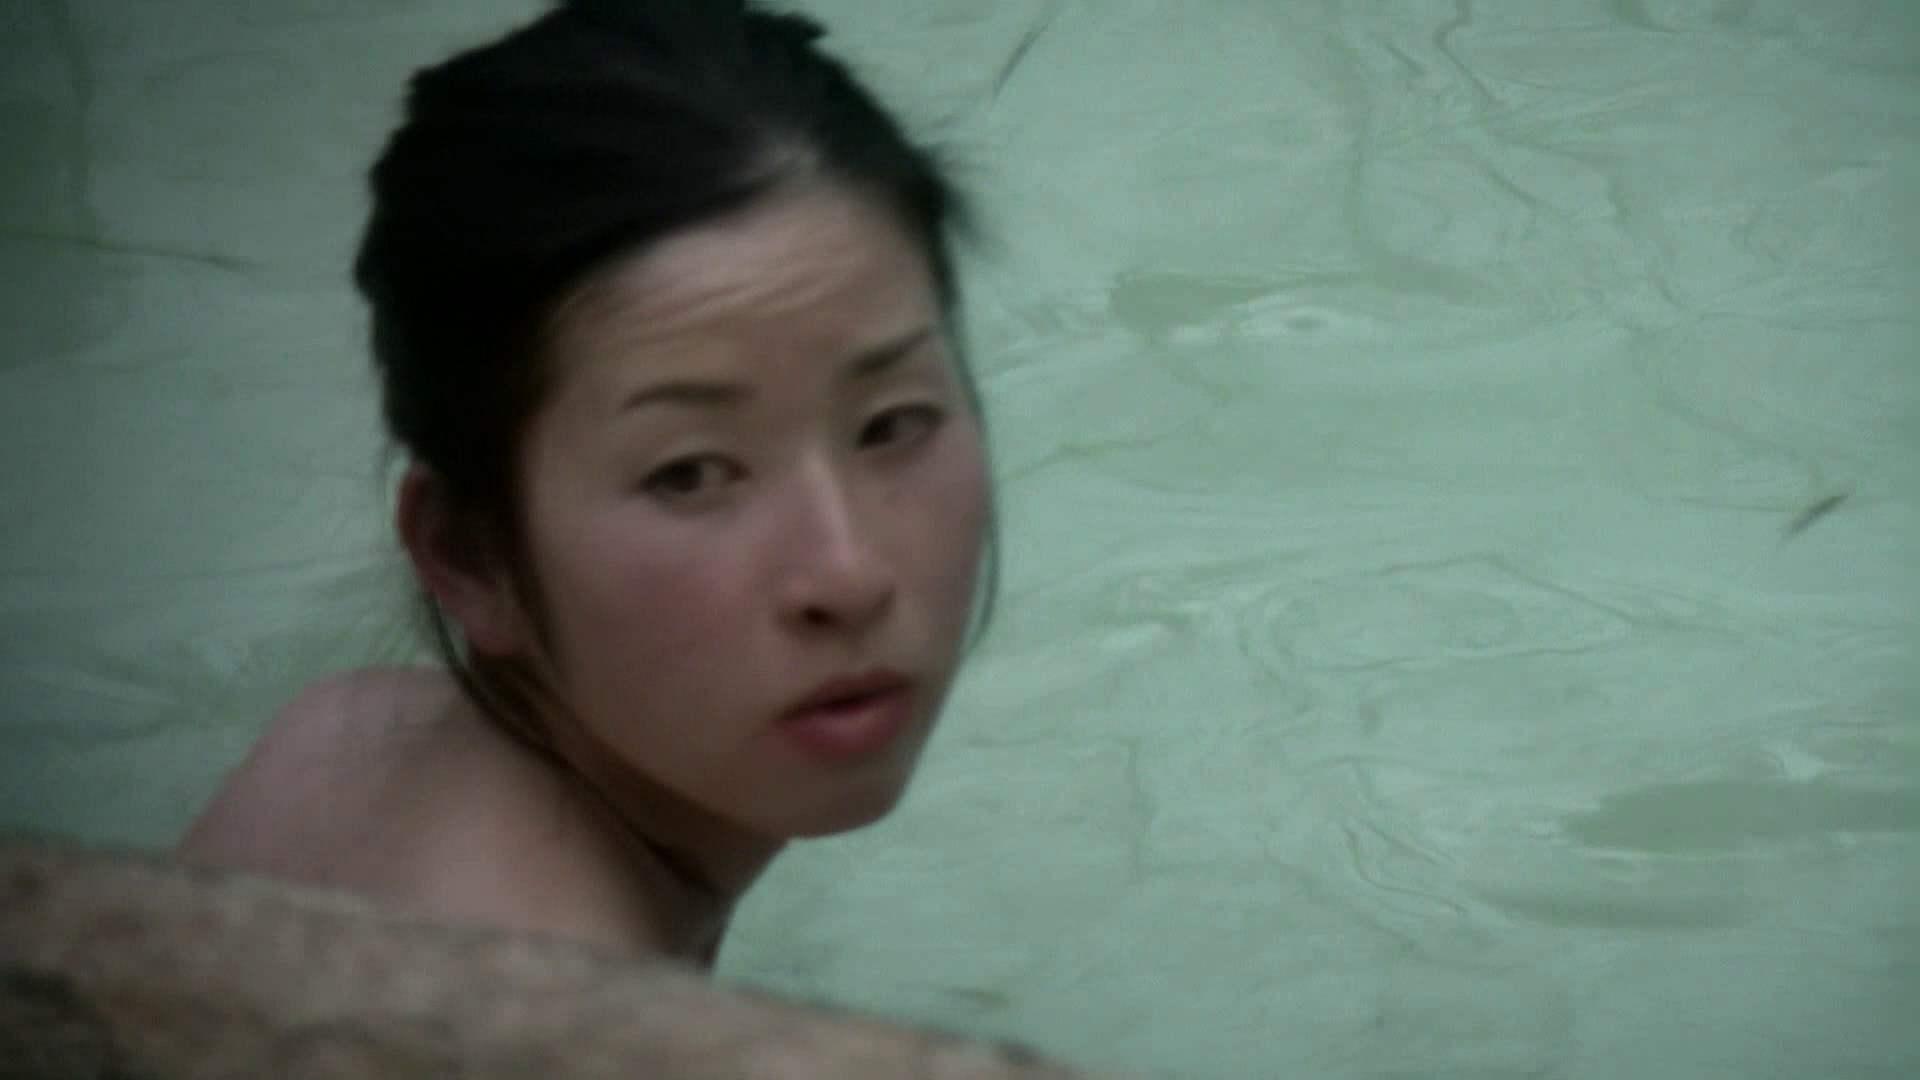 Aquaな露天風呂Vol.656 露天   HなOL  71pic 24